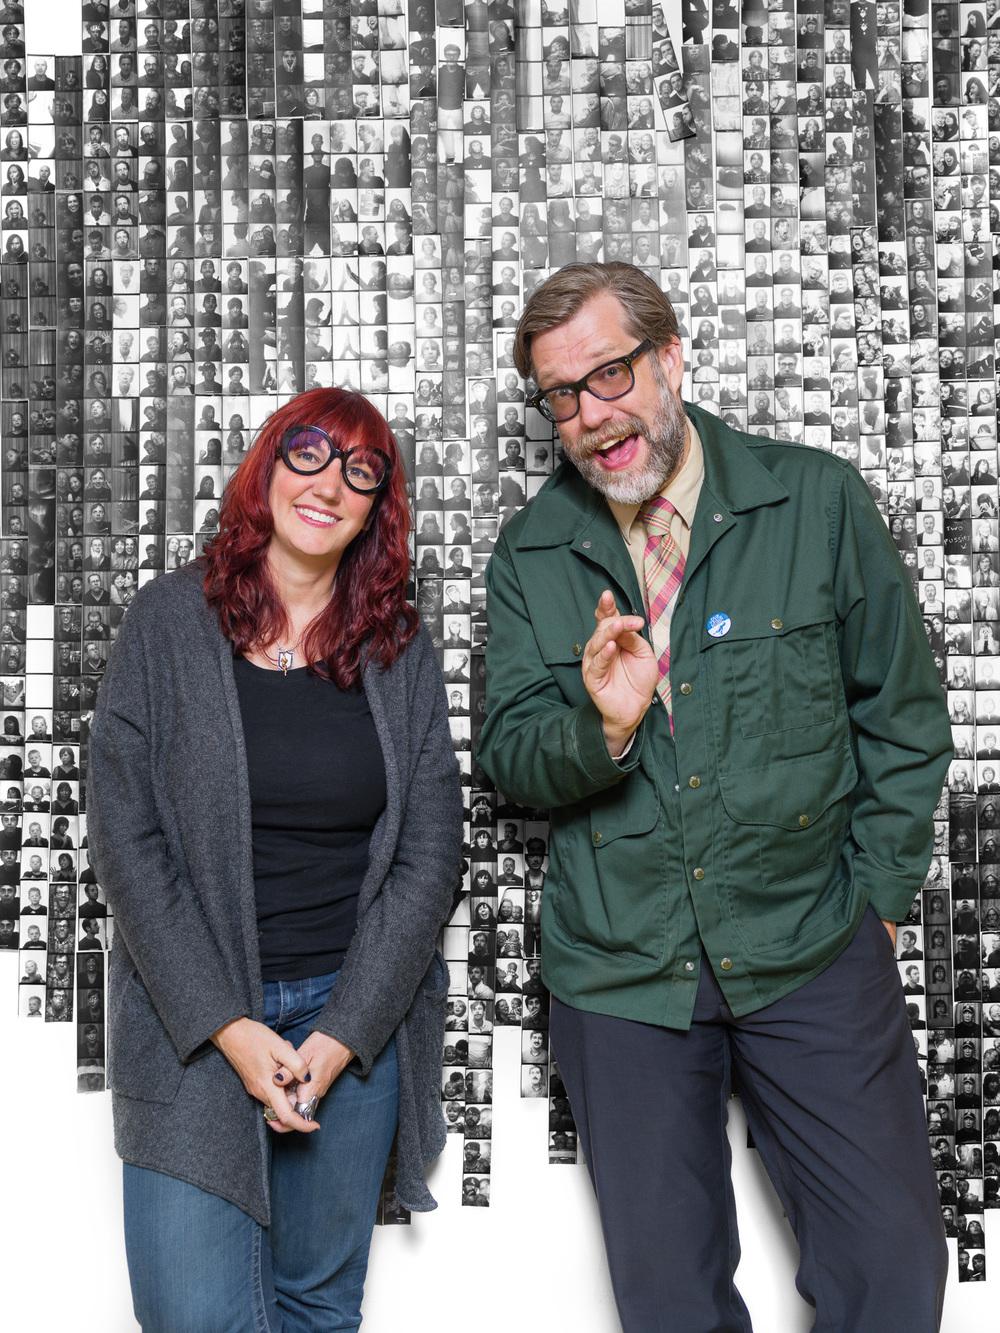 Sub Pop's Megan Jasper and John Roderick of The Long Winters, client: City Arts Magazine